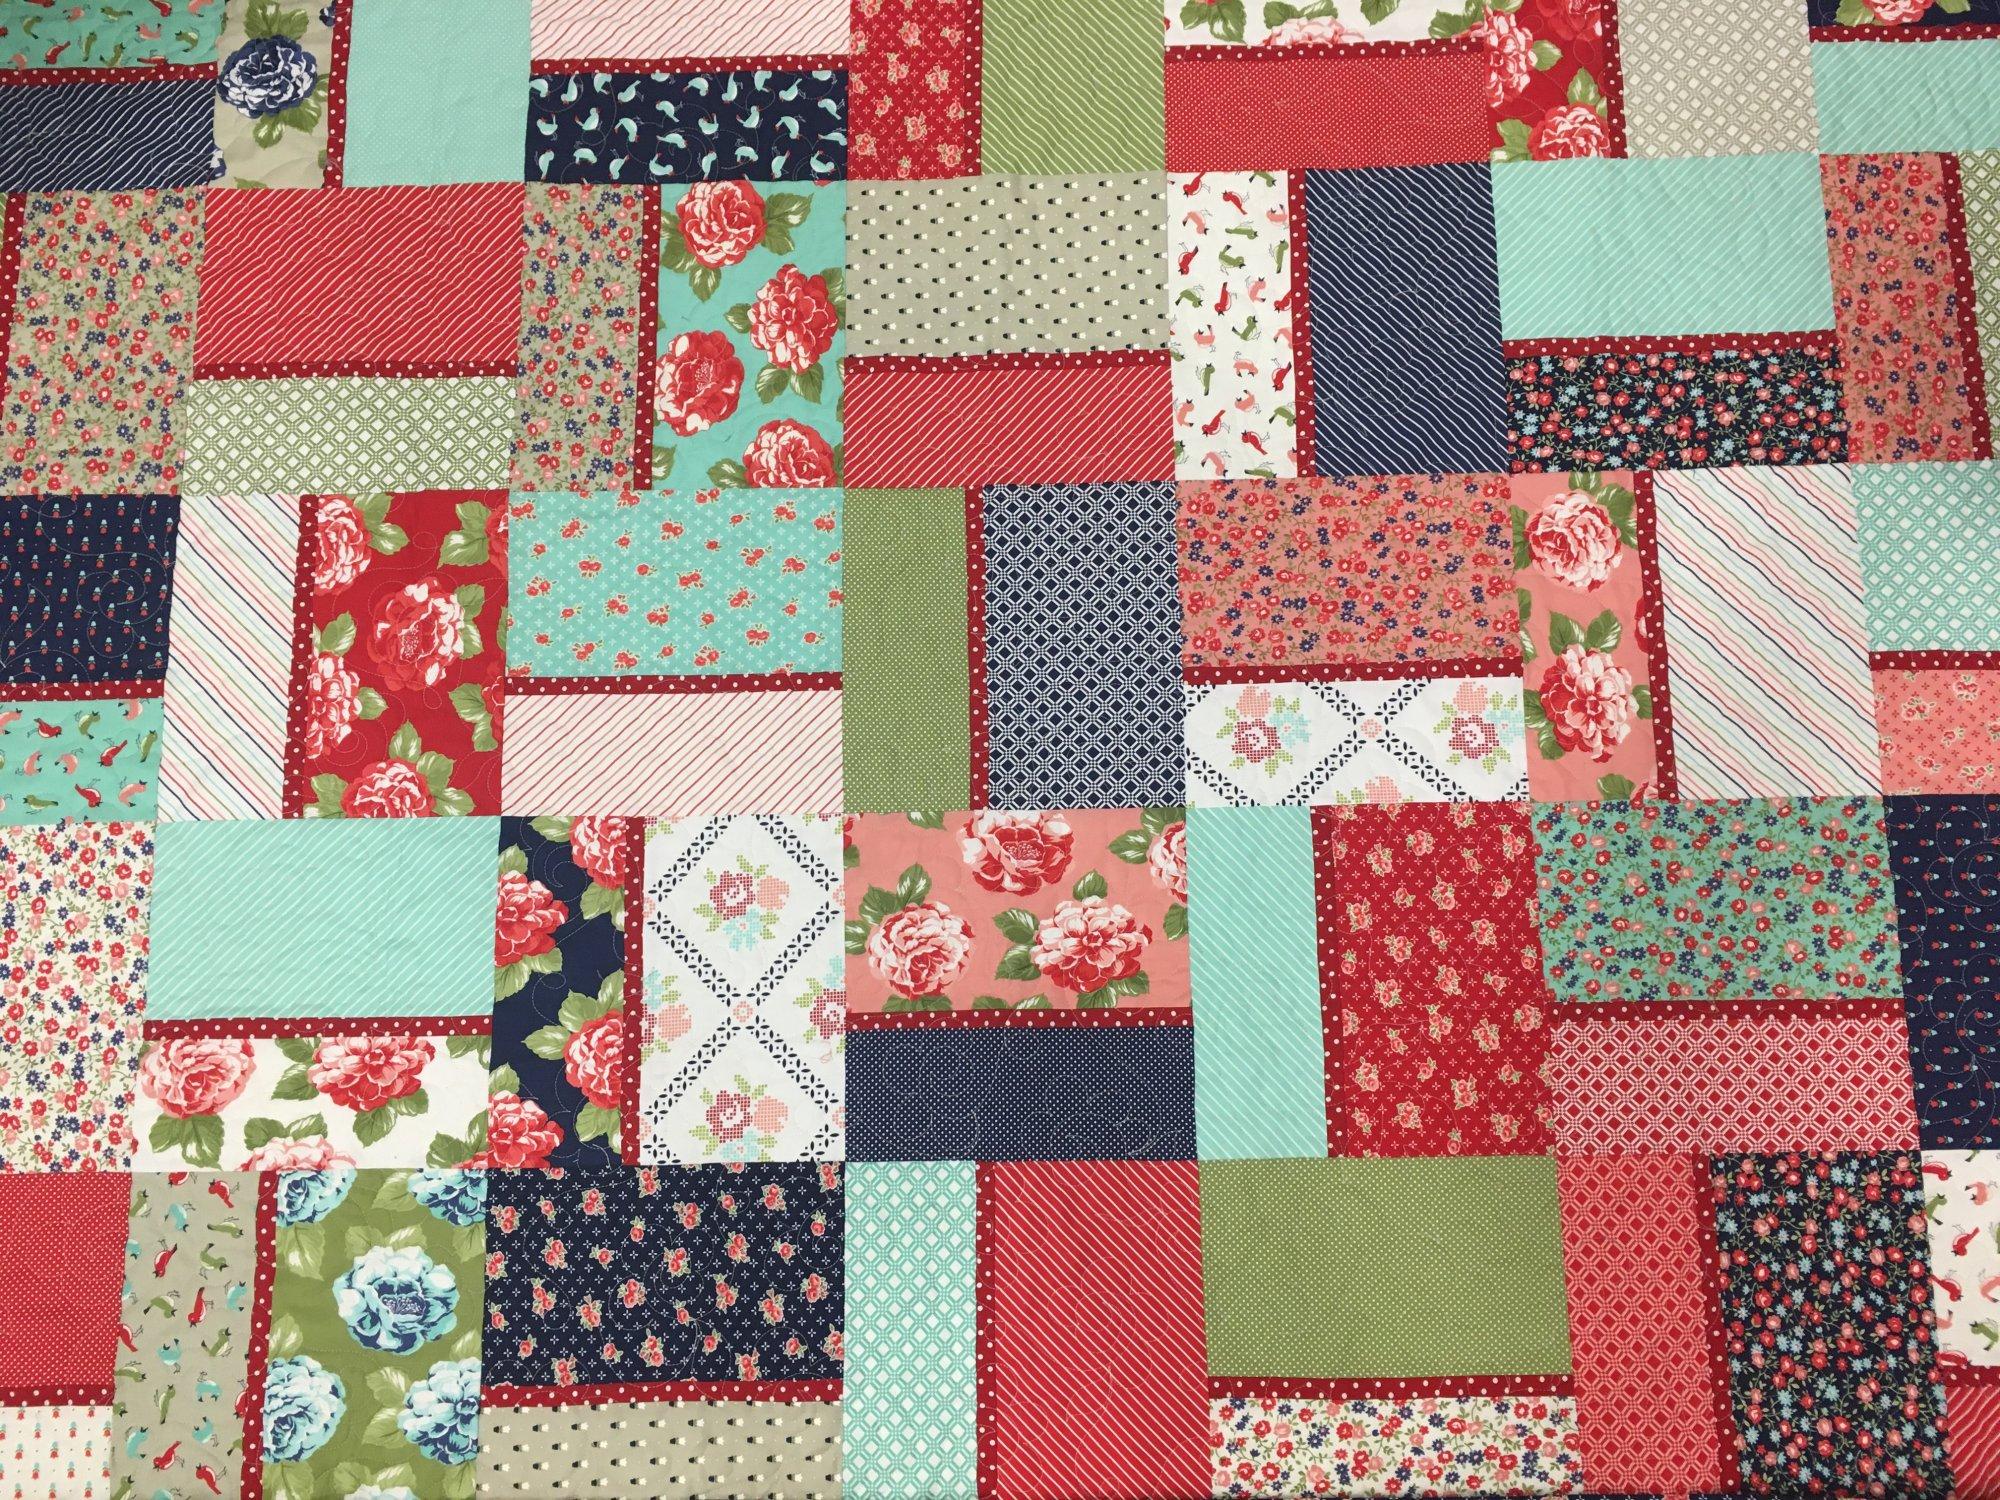 Kit - Color Block - Cotton - without Martelli templates